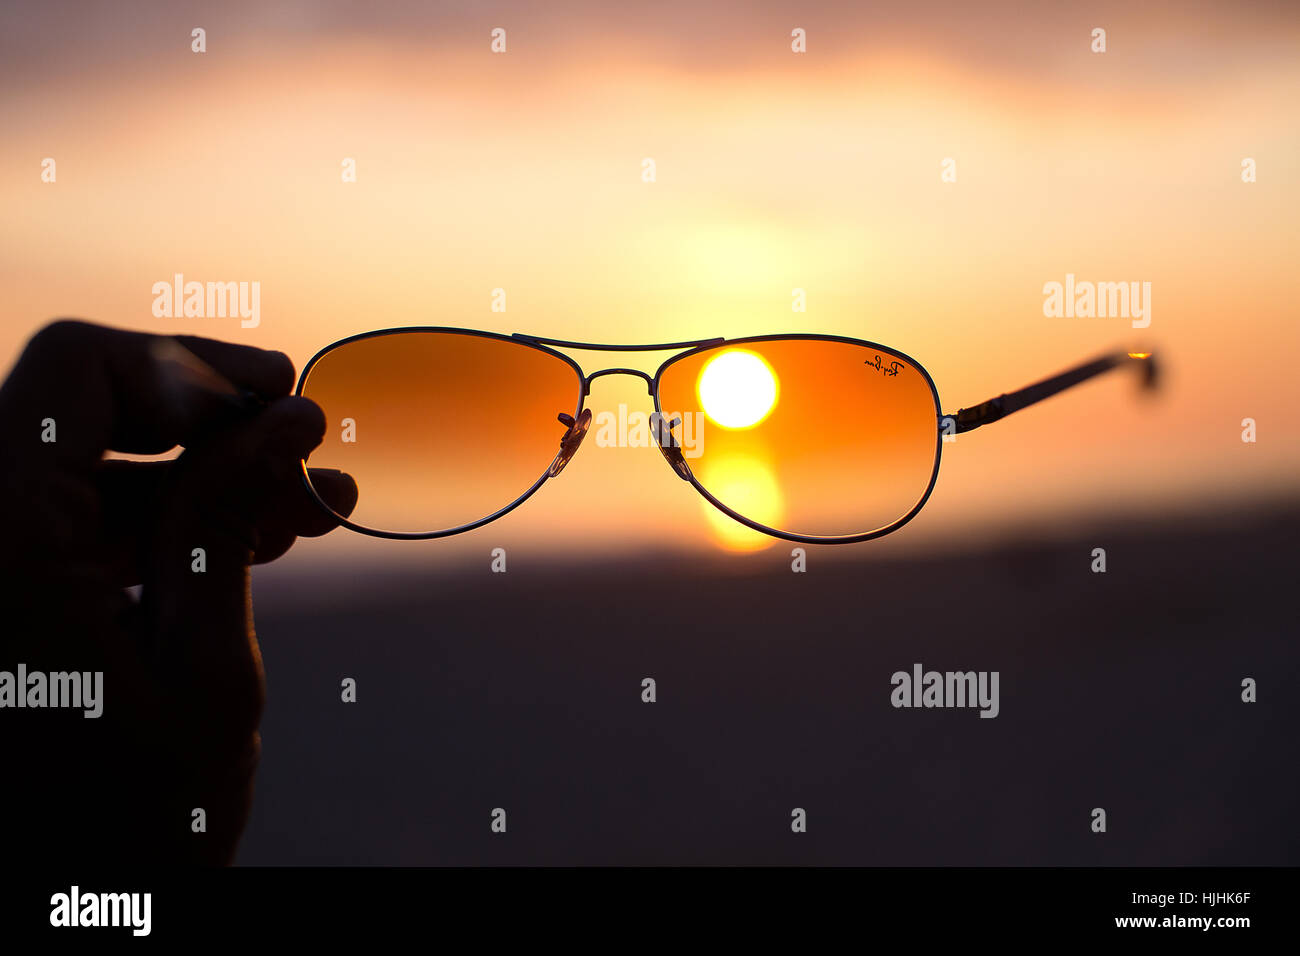 sunglasses and sunset - Stock Image